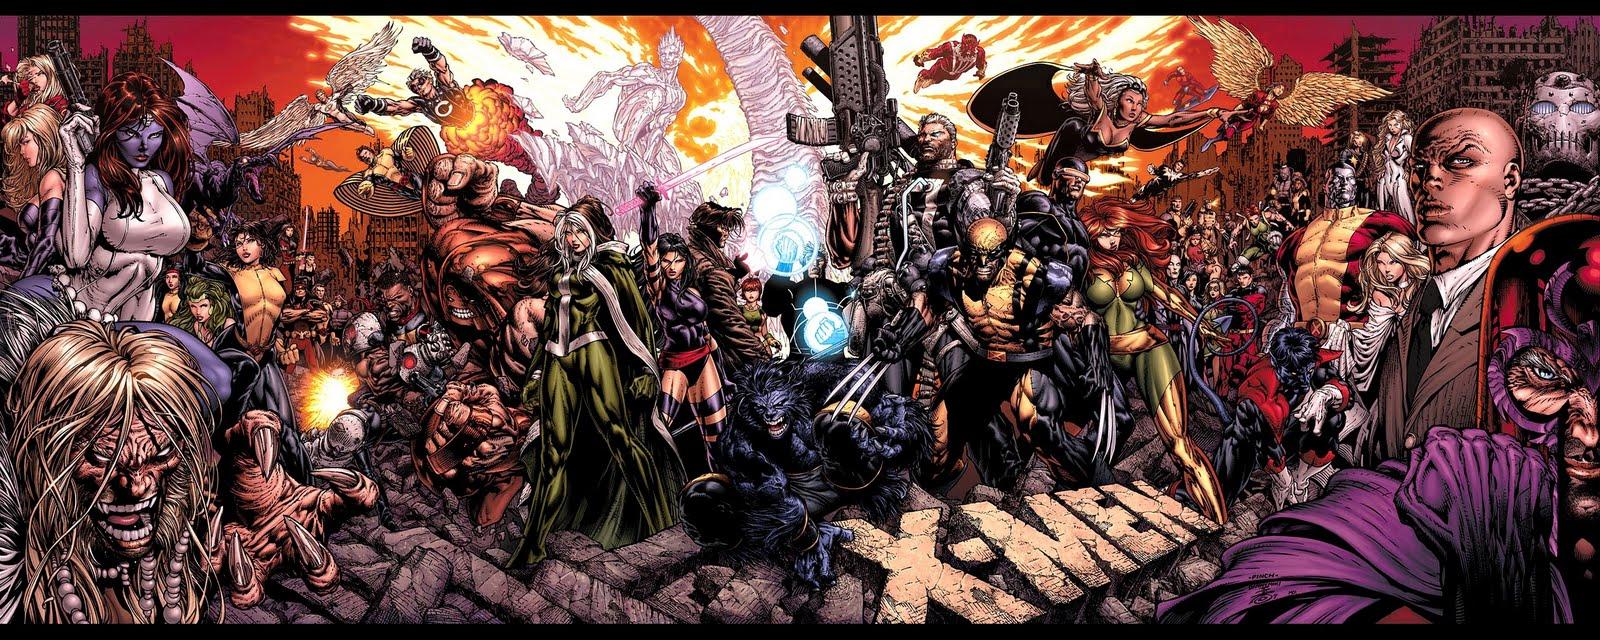 Download All Marvel Comics Together HD Desktop WallpapersHigh 1600x640